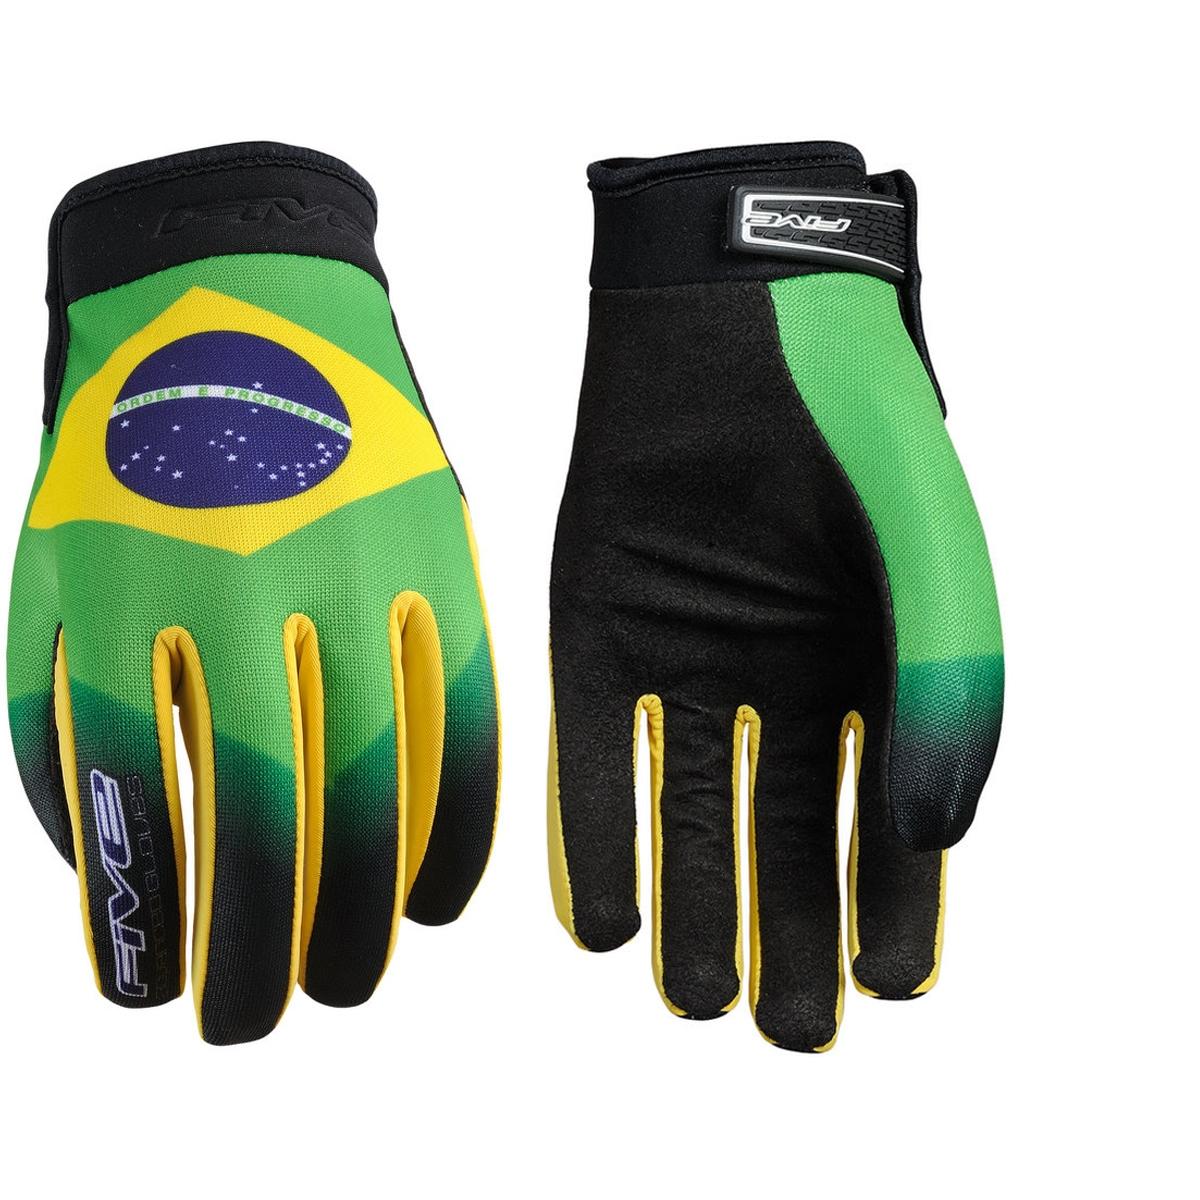 Gants Five Planet Patriot Brésil - XL